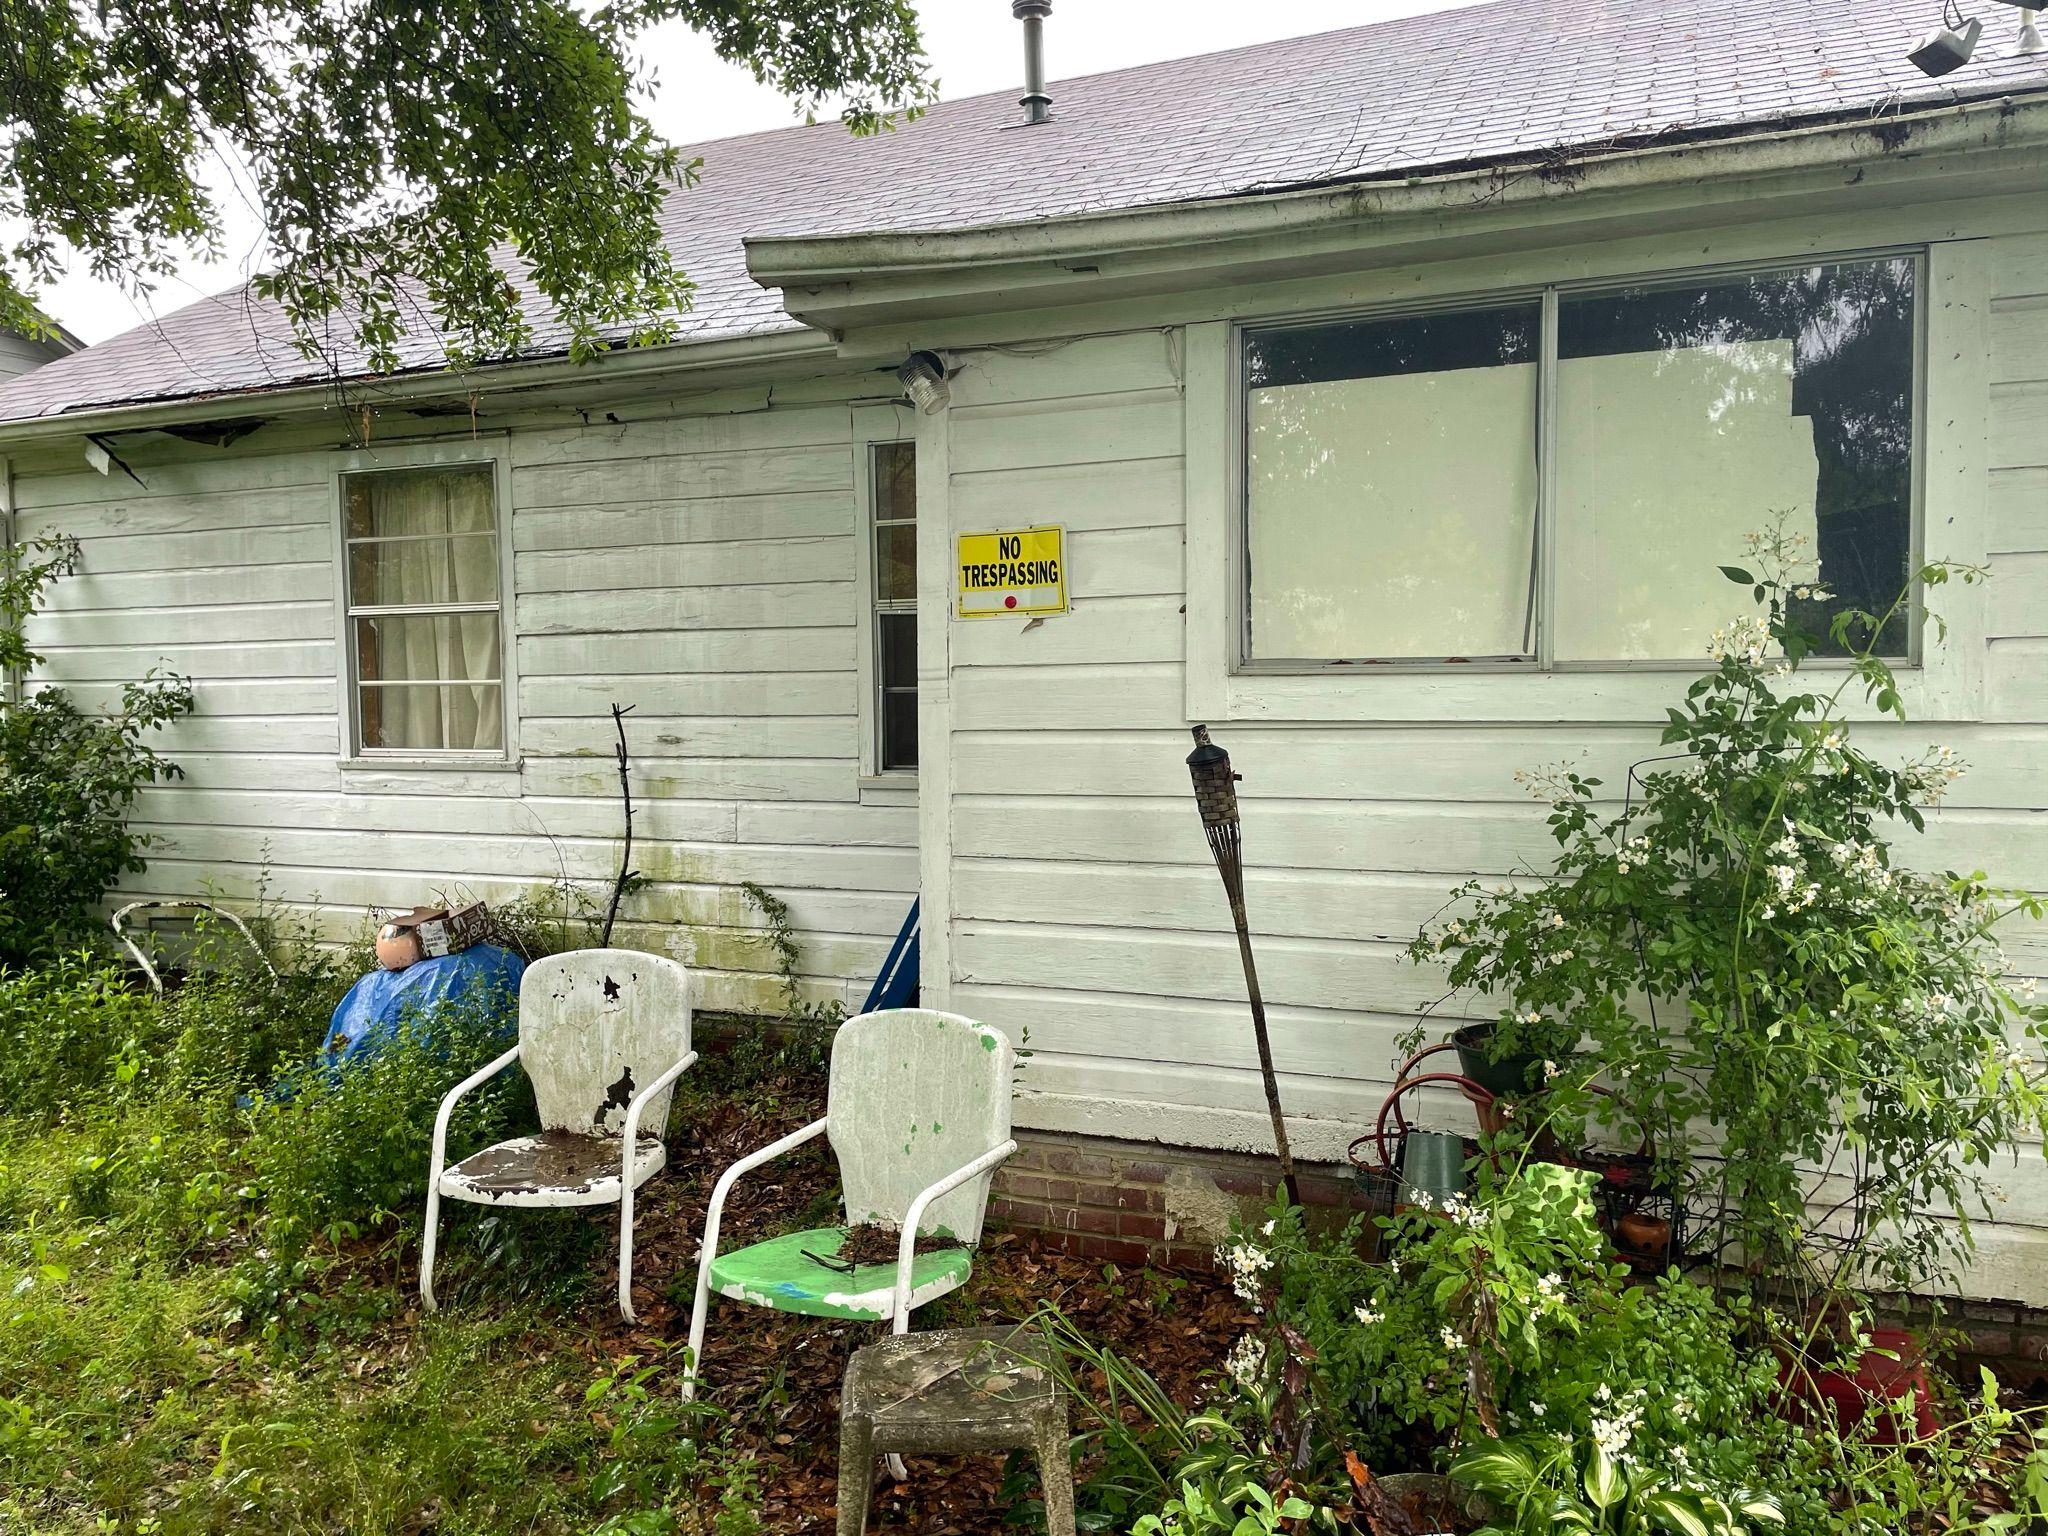 723 Denton St, Benton, AR